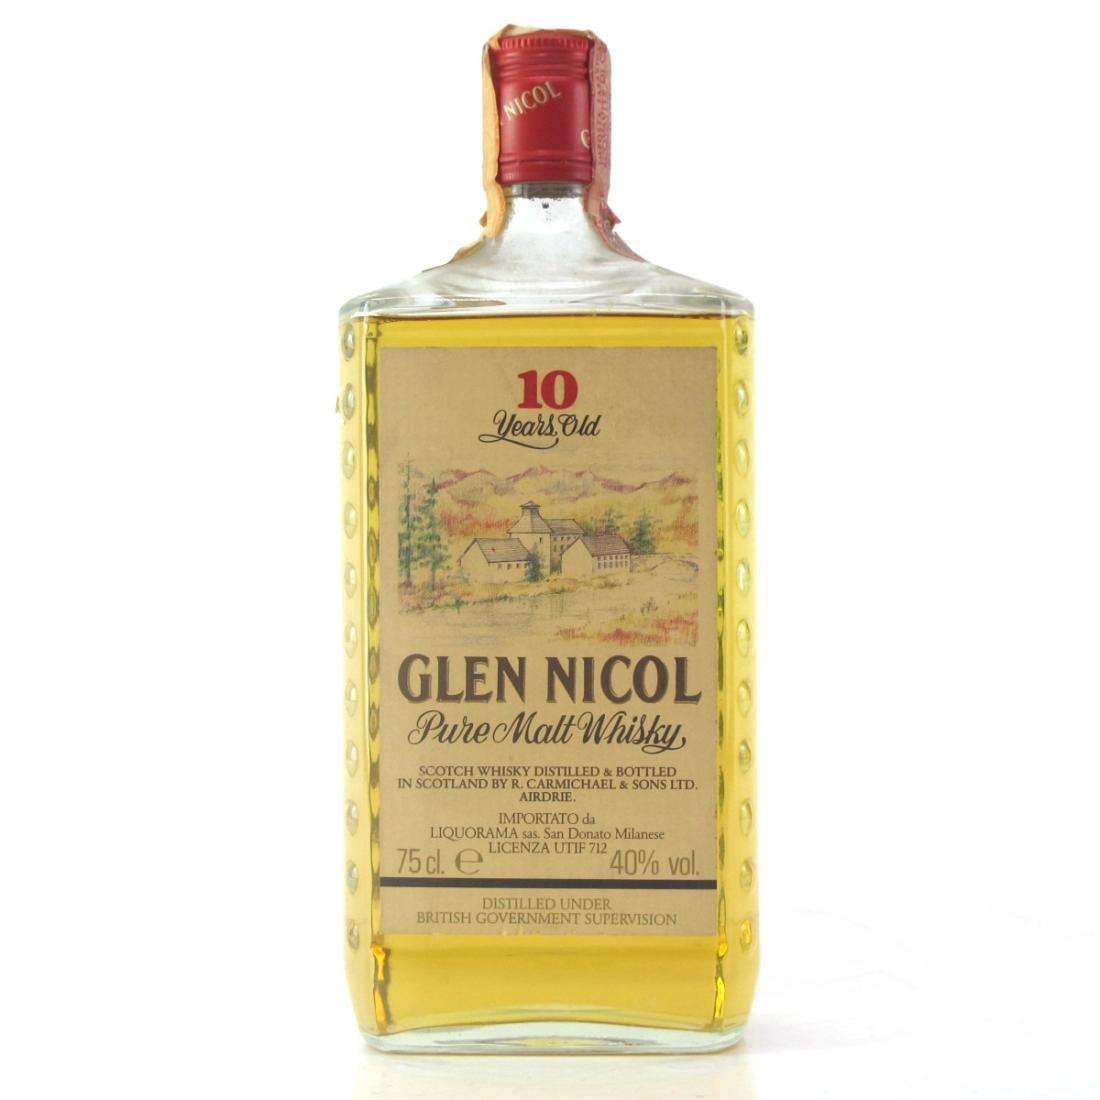 Glen Nicol 10 Year Old Pure Malt 1980s